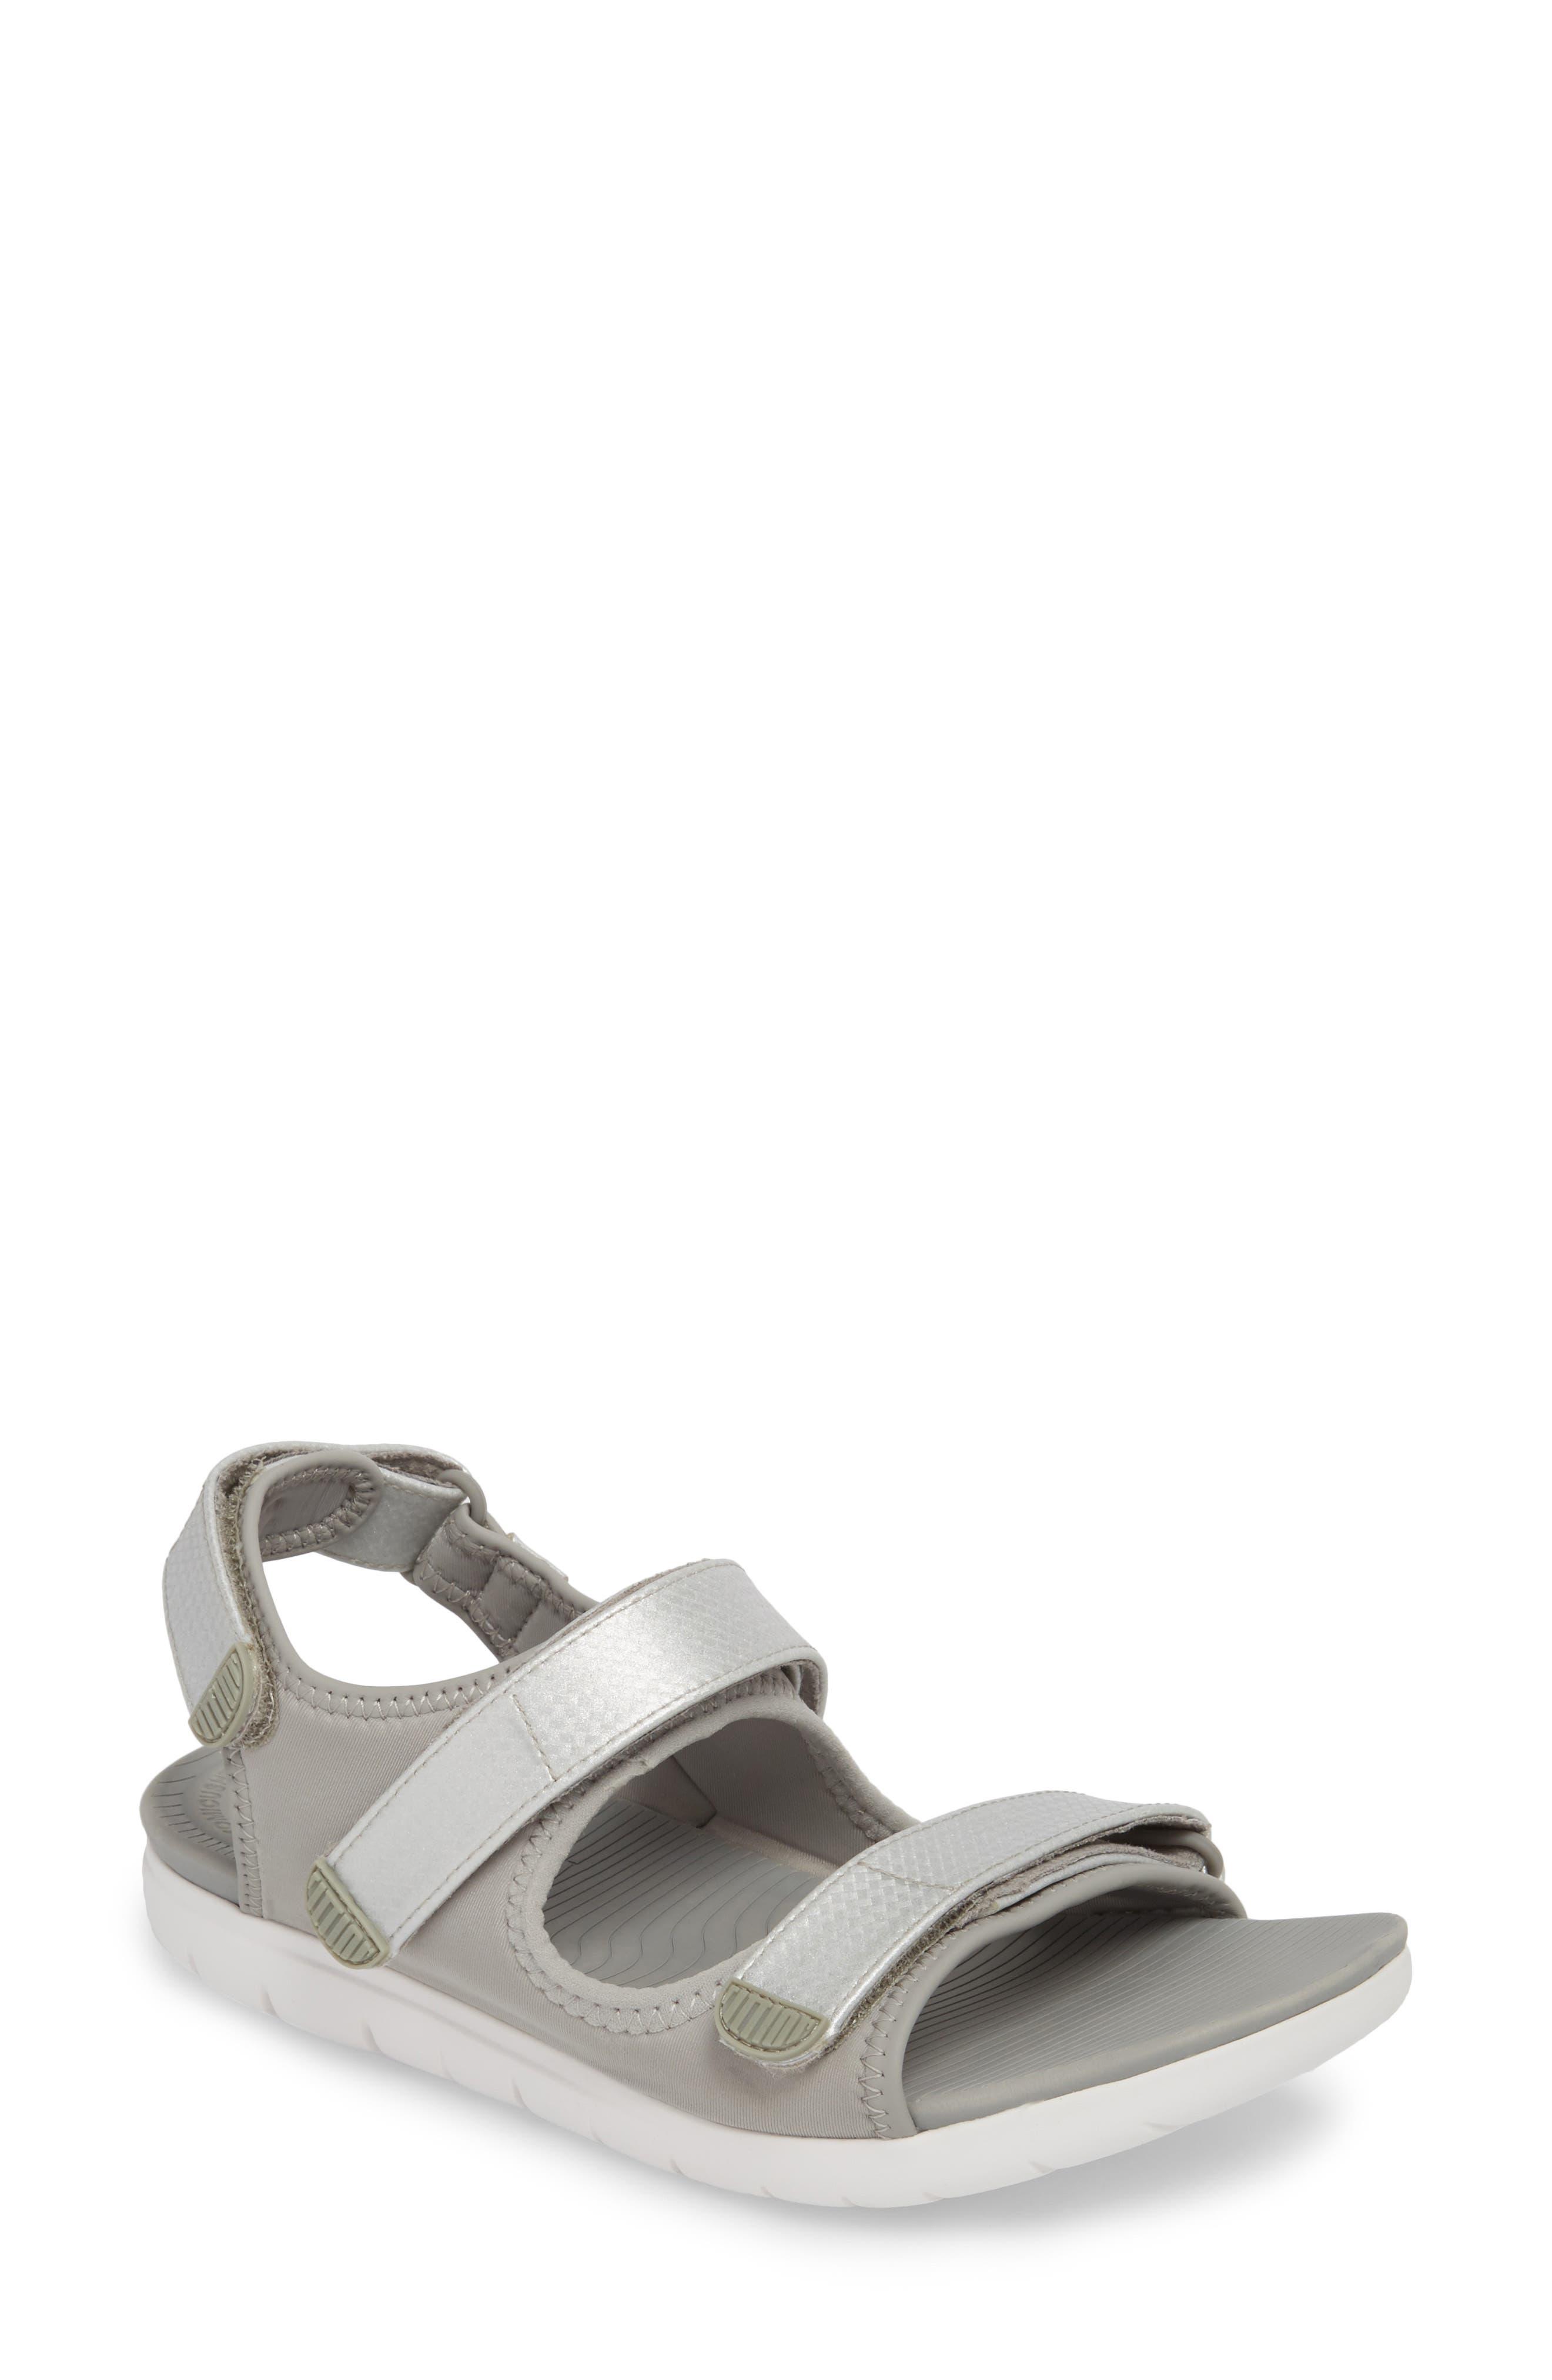 Fitfflop Neoflex(TM) Back Strap Sandal, Grey